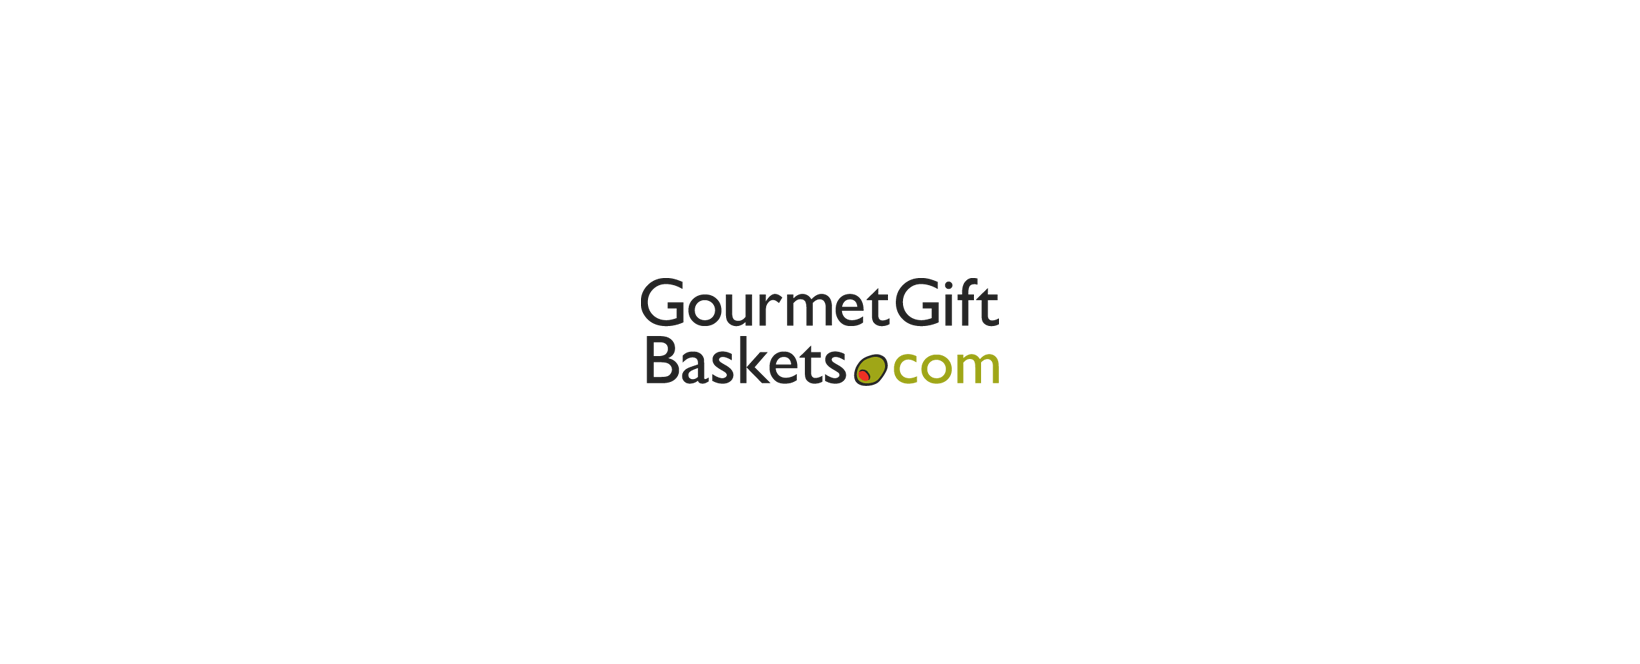 Gourmet Gift Baskets Discount Code 2021